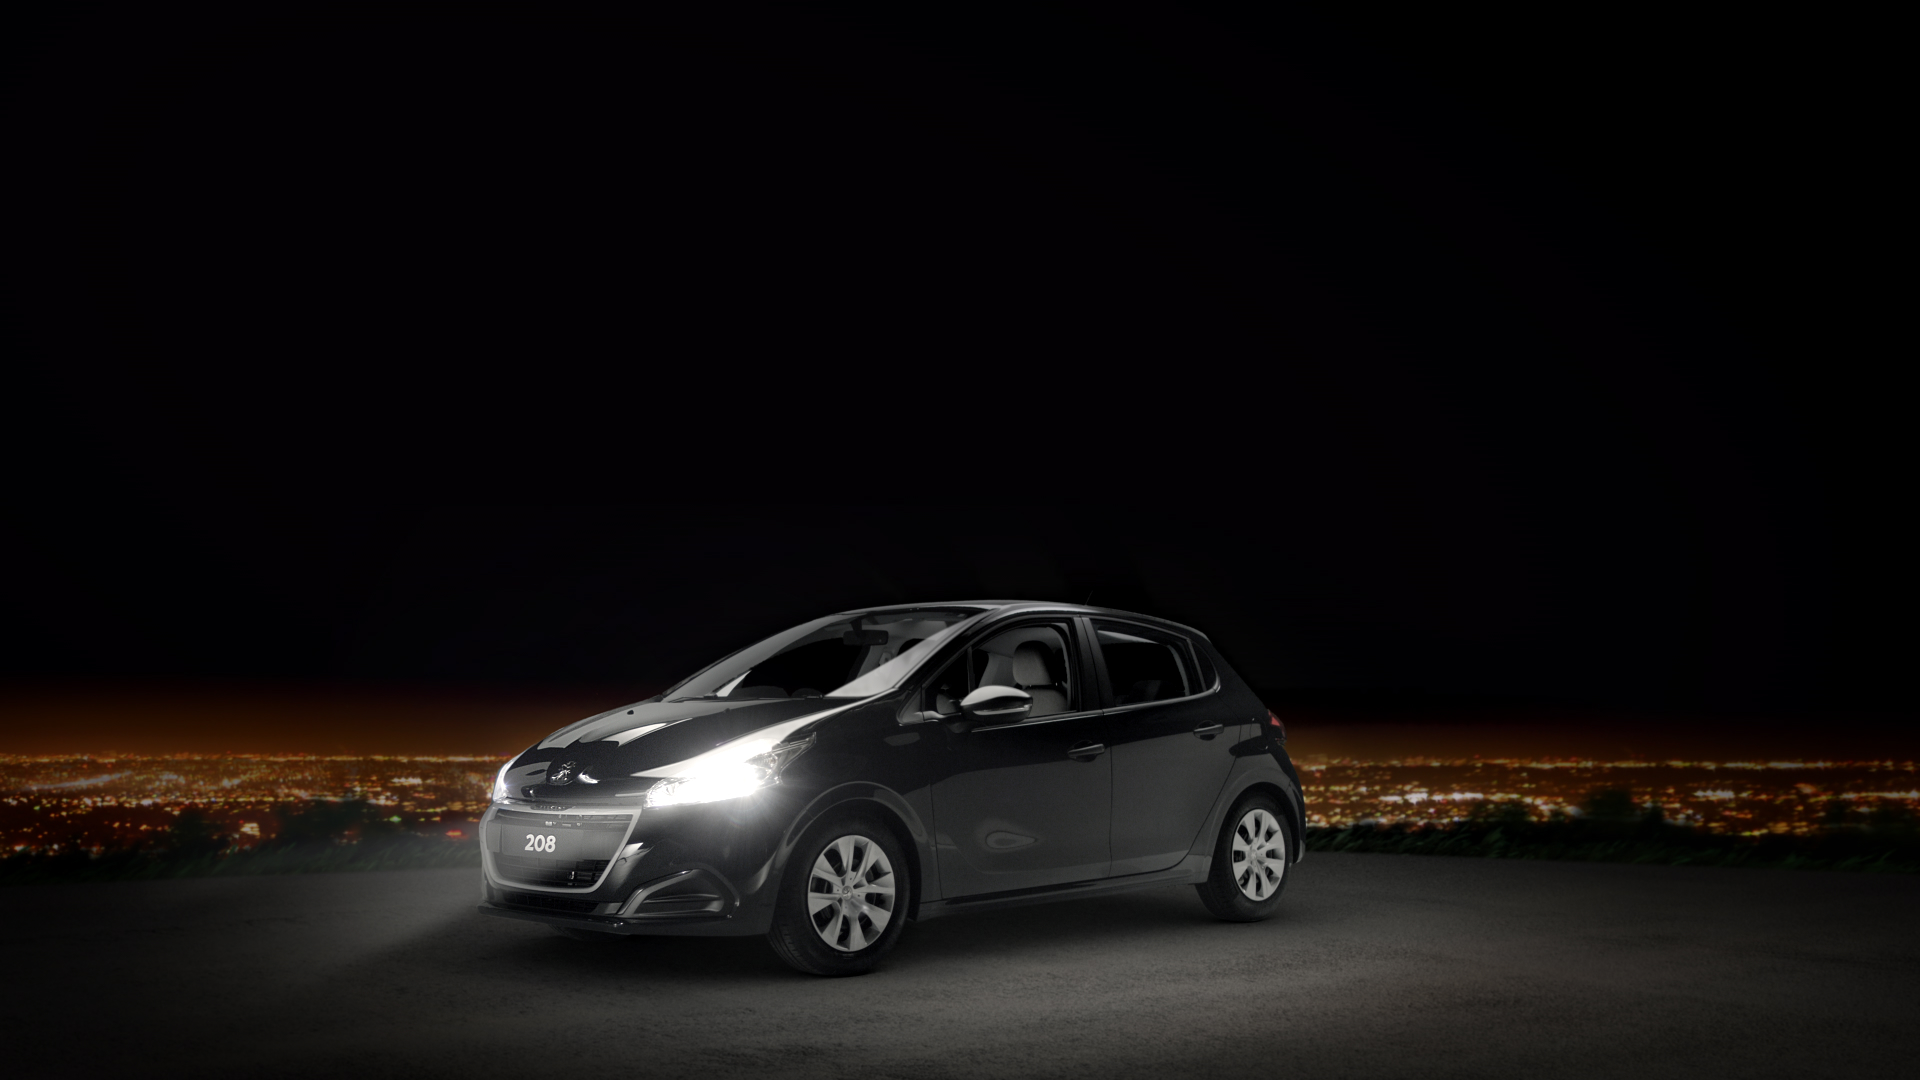 Peugeot_Car_BLACK.jpg